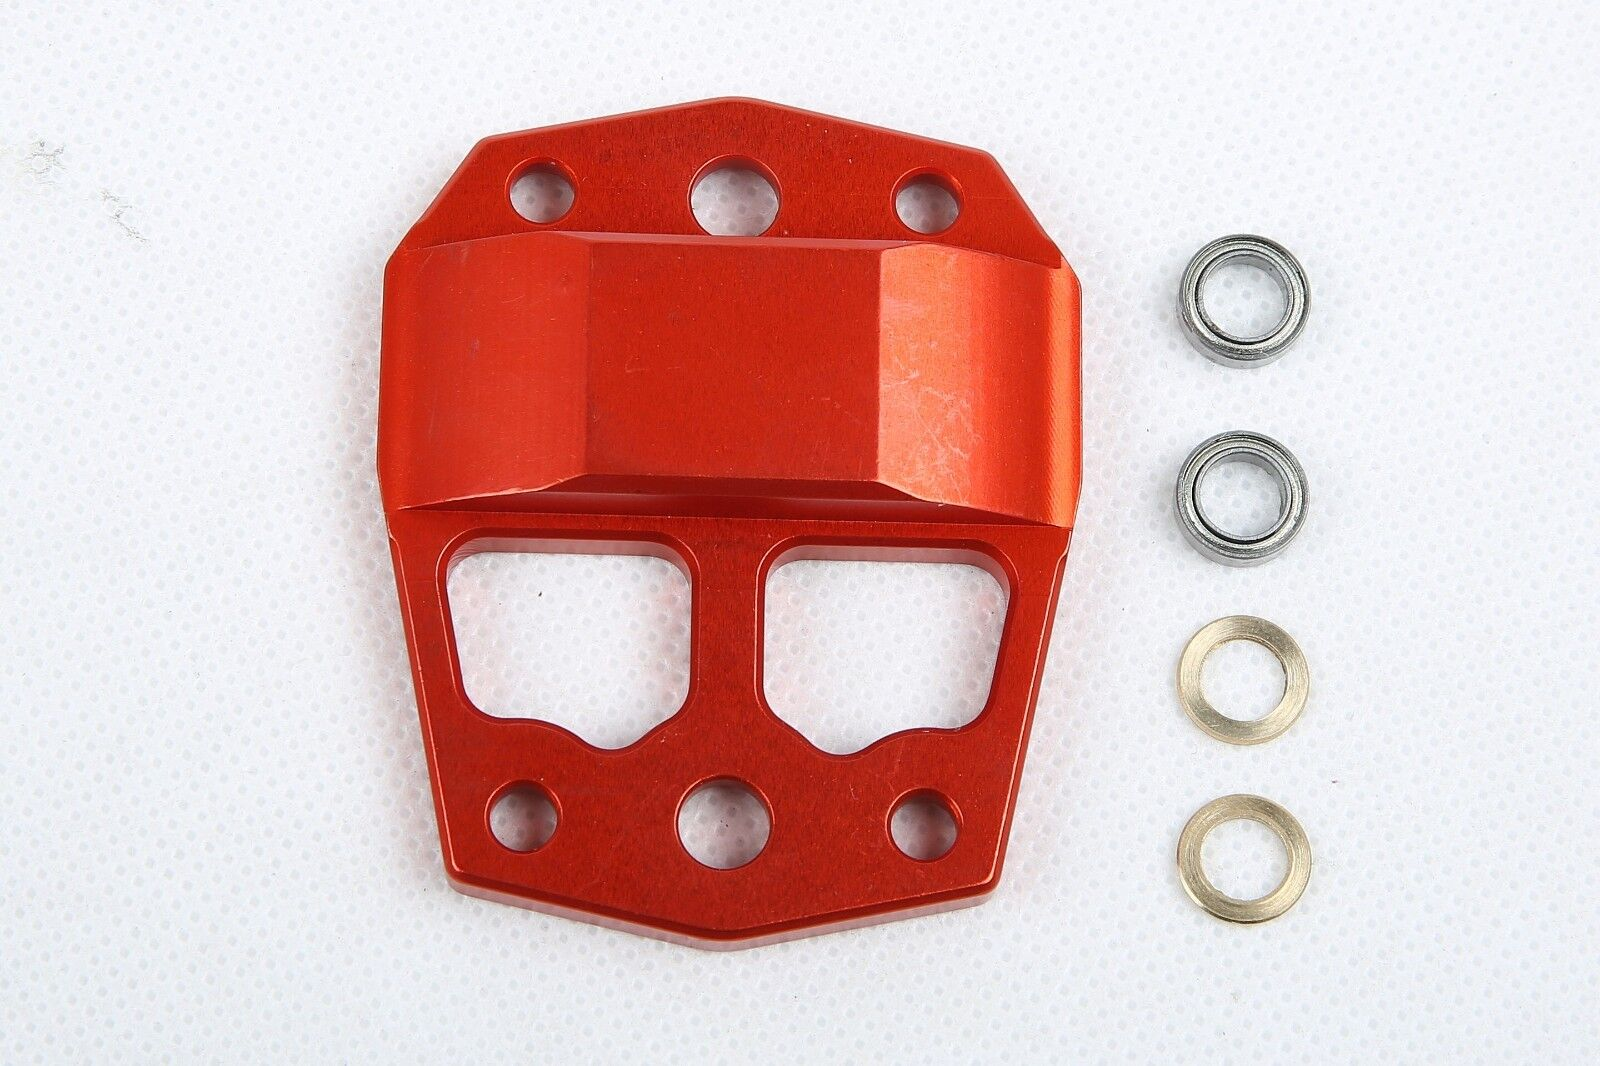 Metal center differential gear cover orange orange orange Red  for Losi 5ive T 41b0de